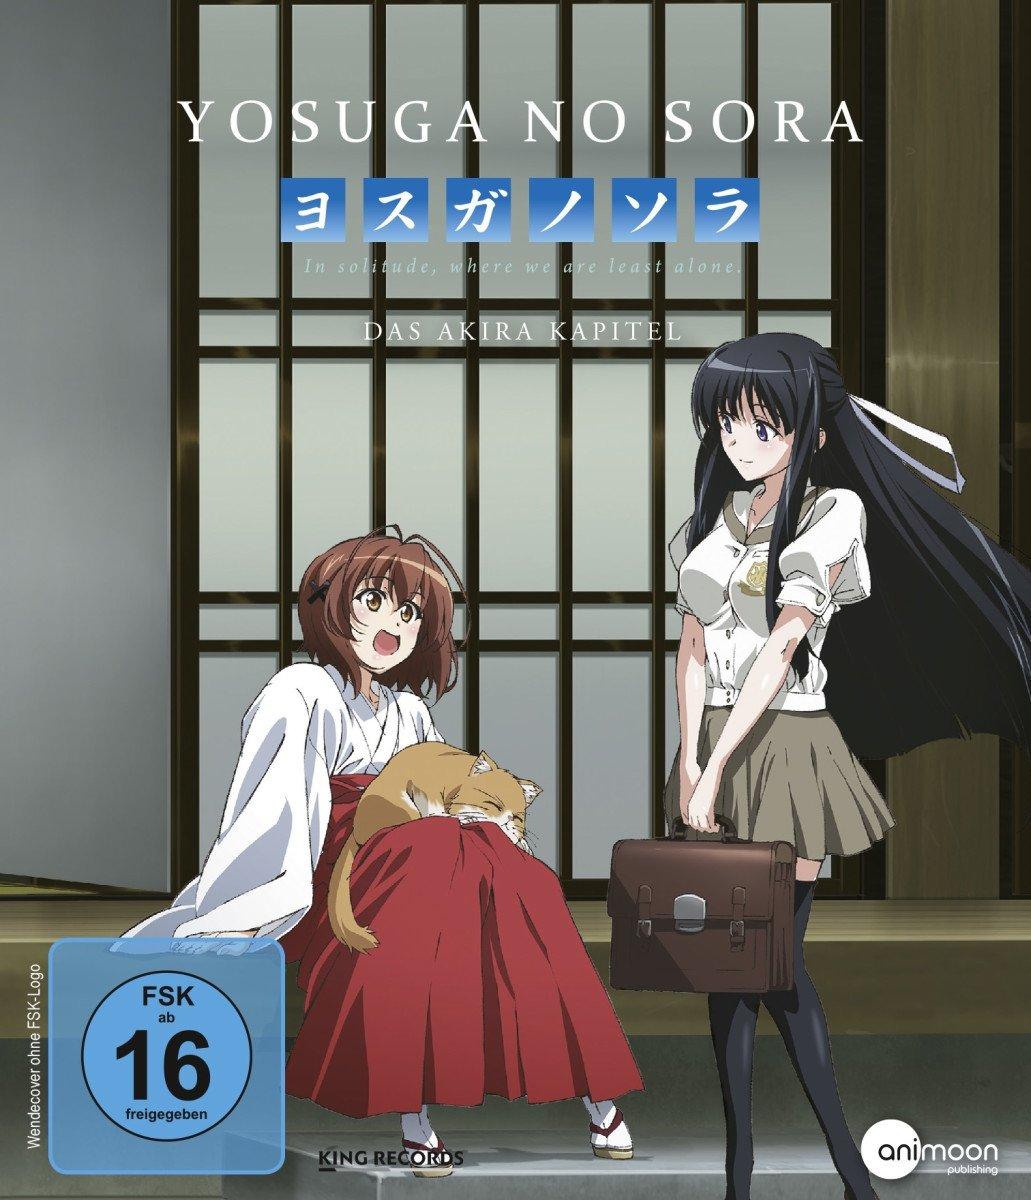 Yosuga no Sora - Vol.2 - Das Akira Kapitel Standard Edition: Amazon ...